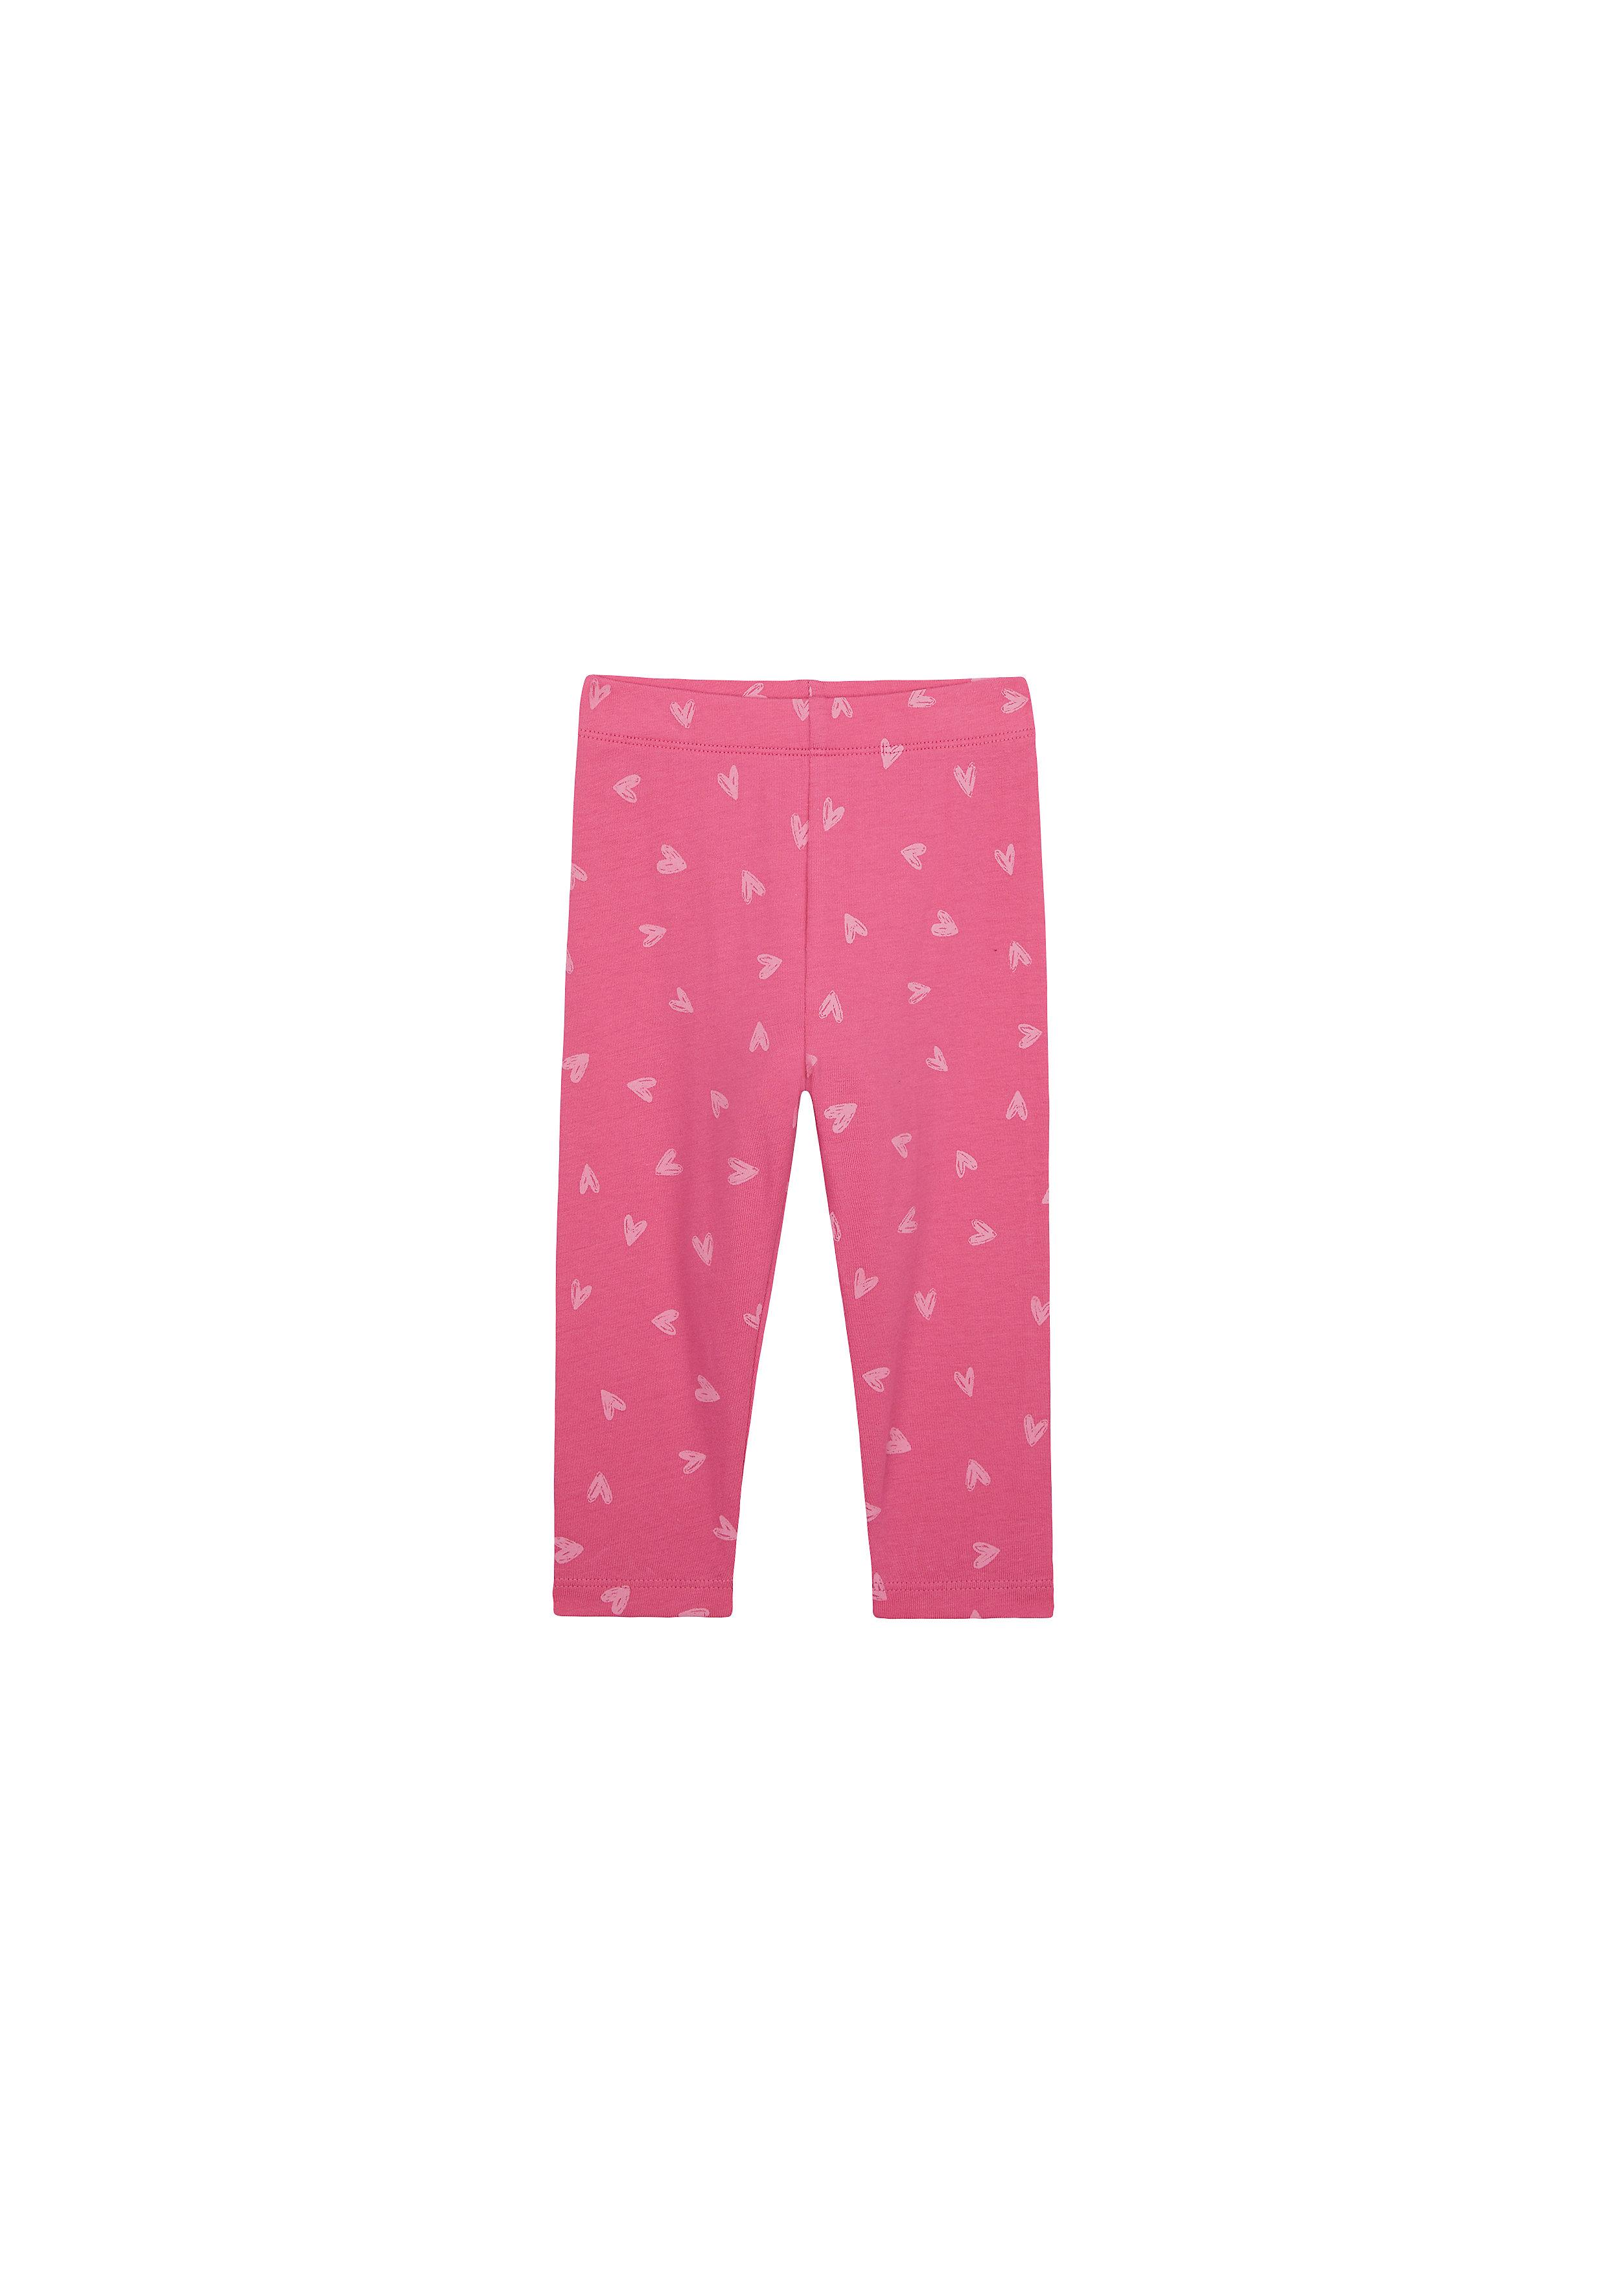 Mothercare | Girls Leggings Heart Print - Pink